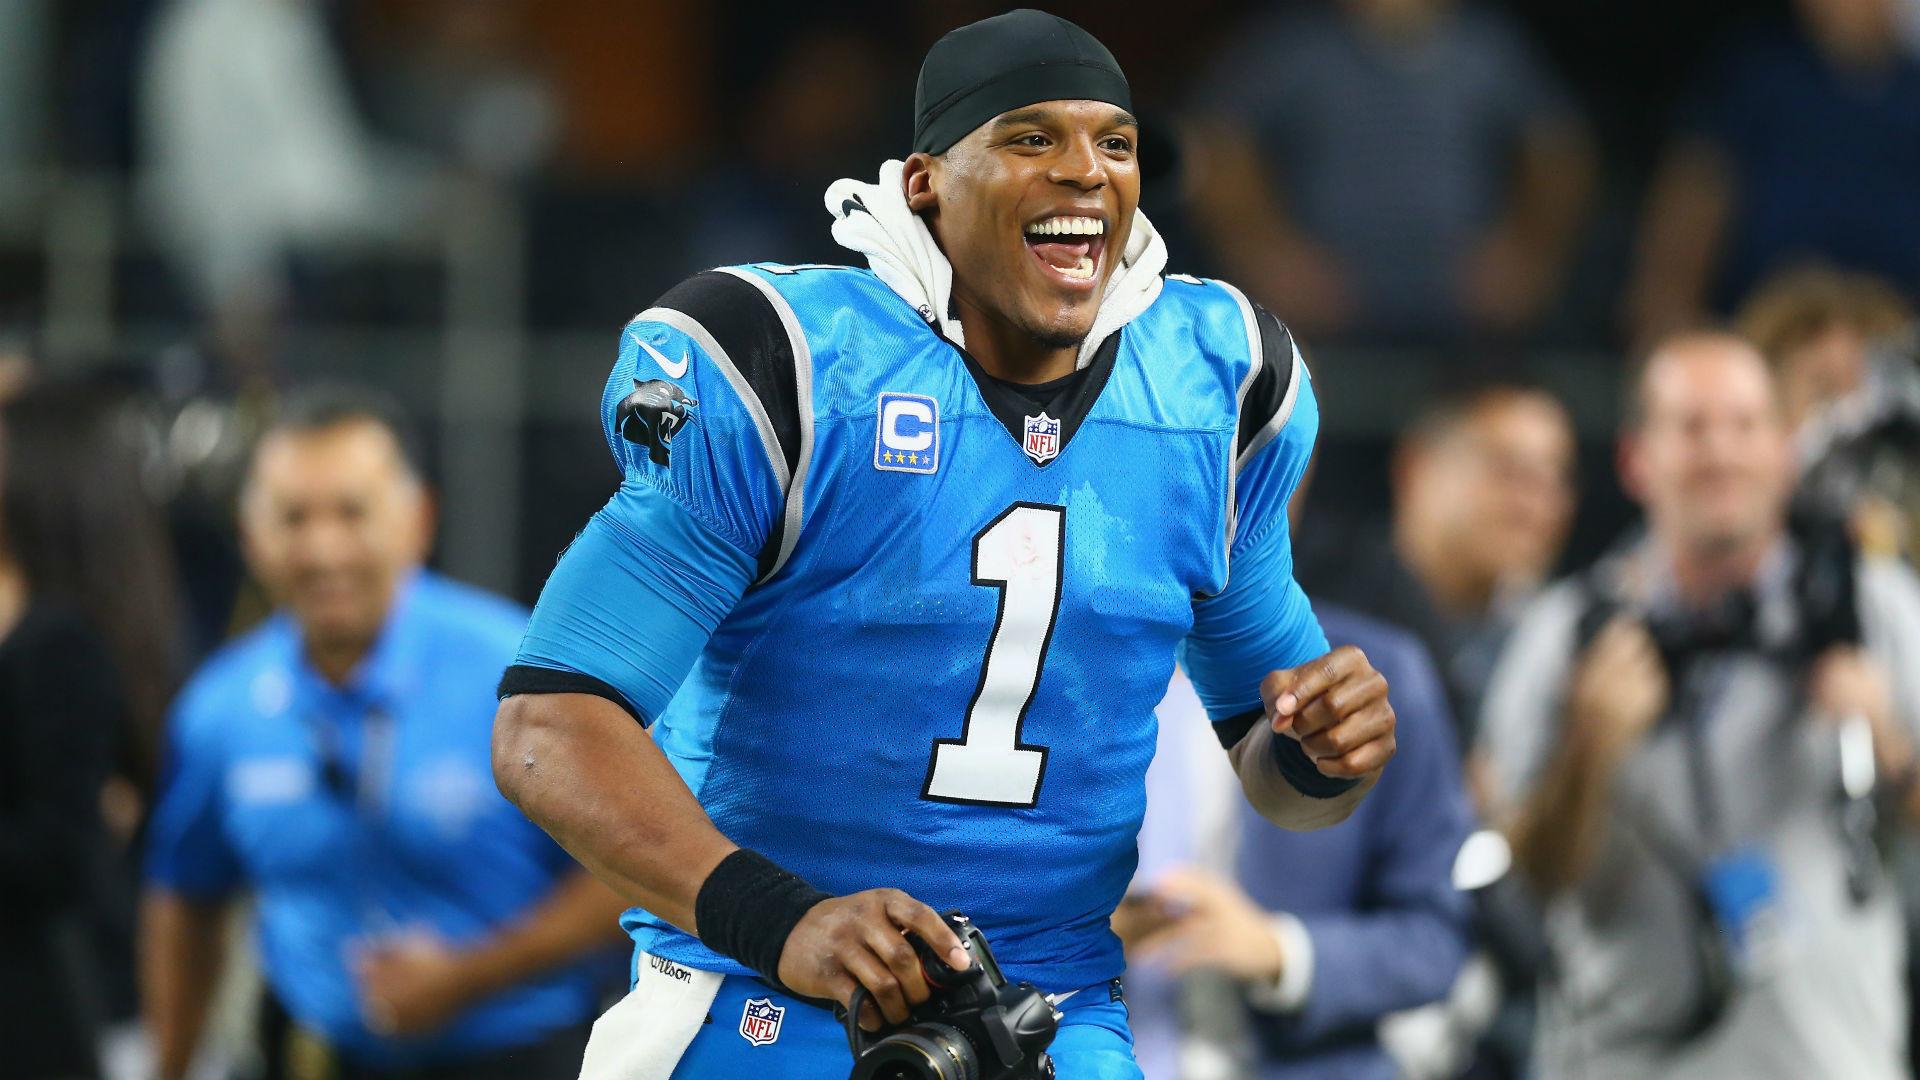 1 Cam Newton, QB, Panthers